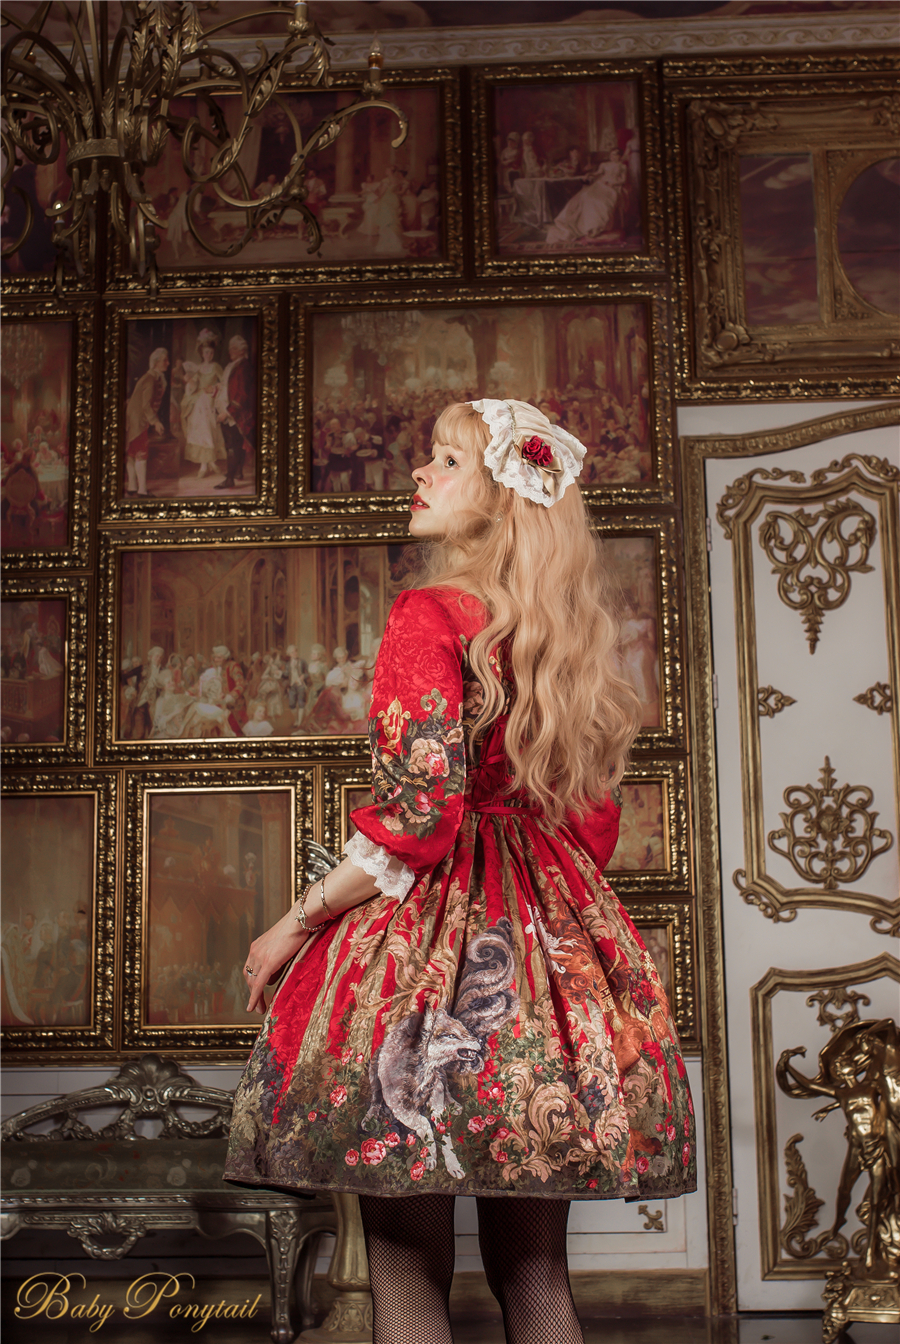 BabyPonytail_Rose Battle_Model Photo_OP Red studio_Claudia_10.jpg